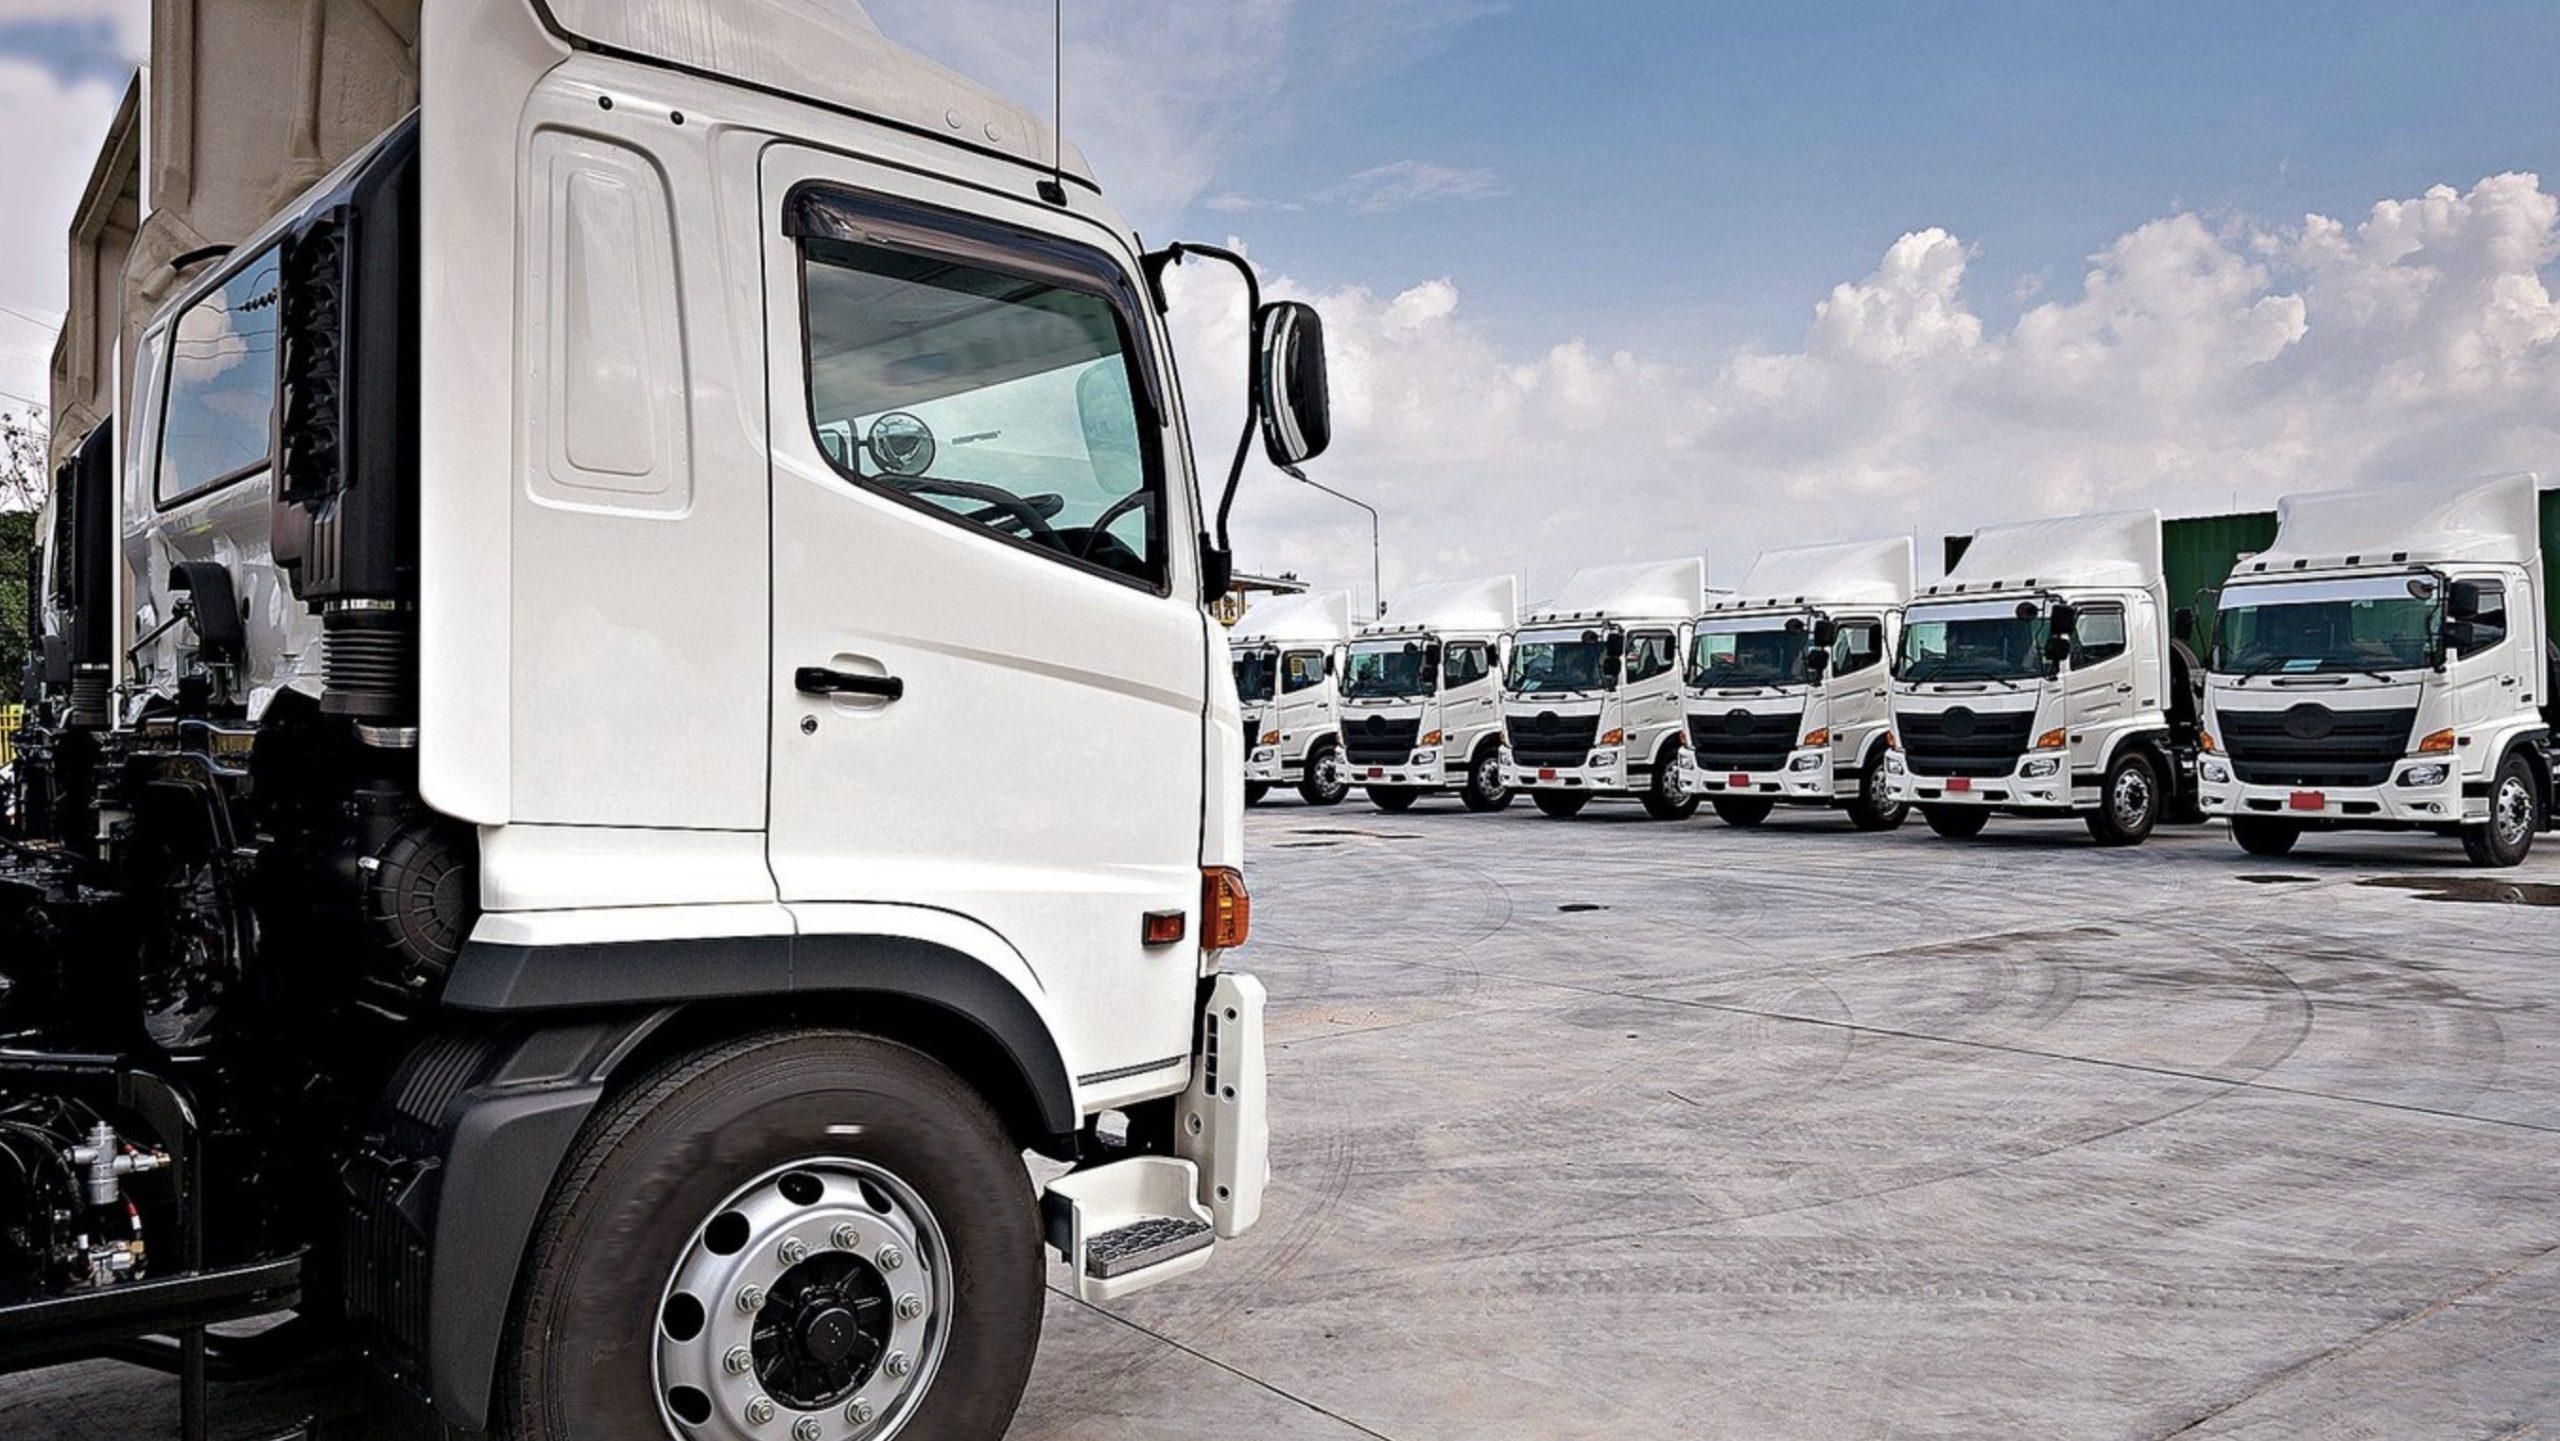 Working with SAP Transportation Management and SAP Yard Logistics